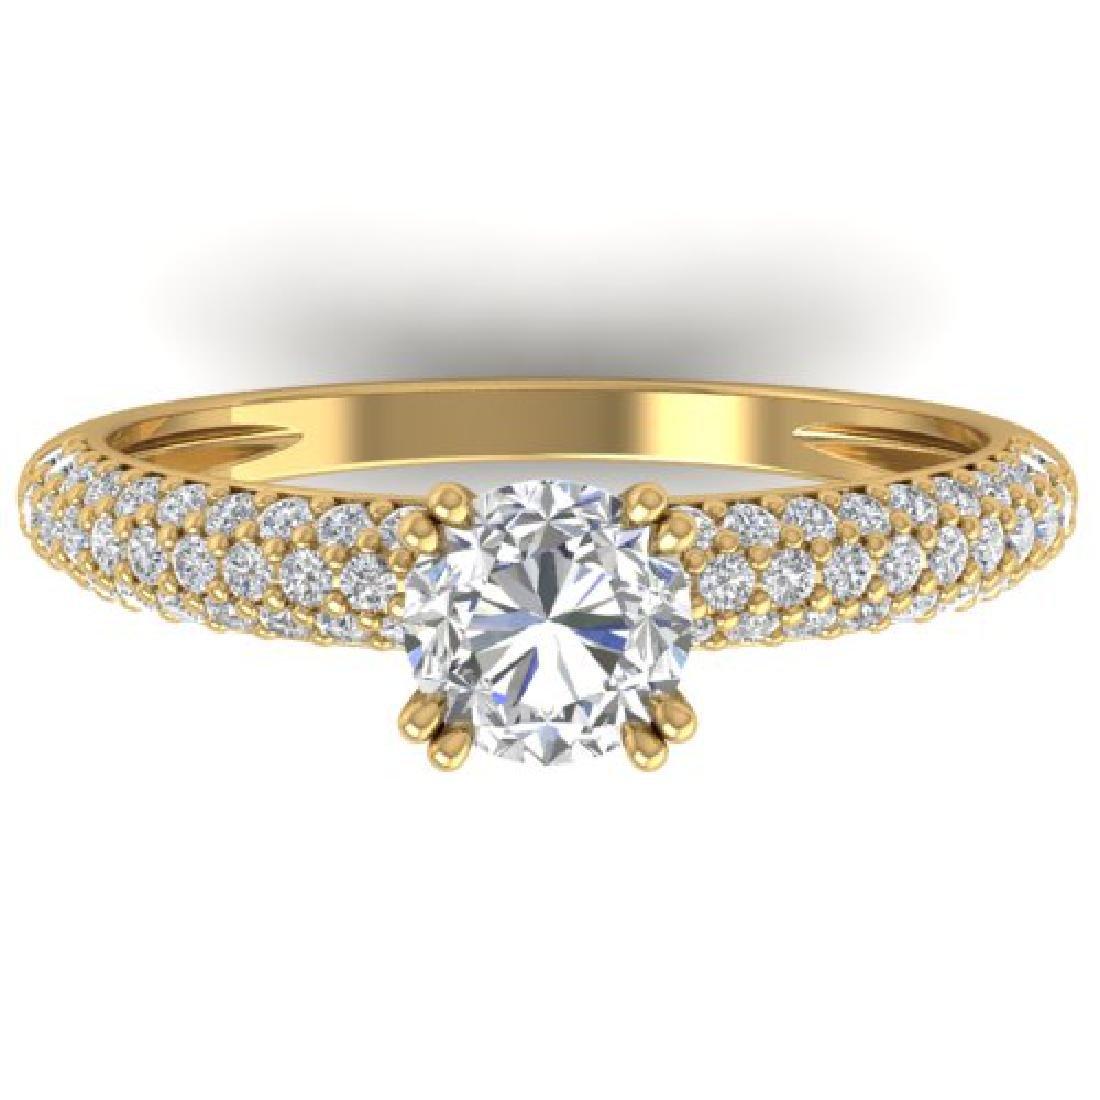 1.4 CTW Certified VS/SI Diamond Solitaire Art Deco